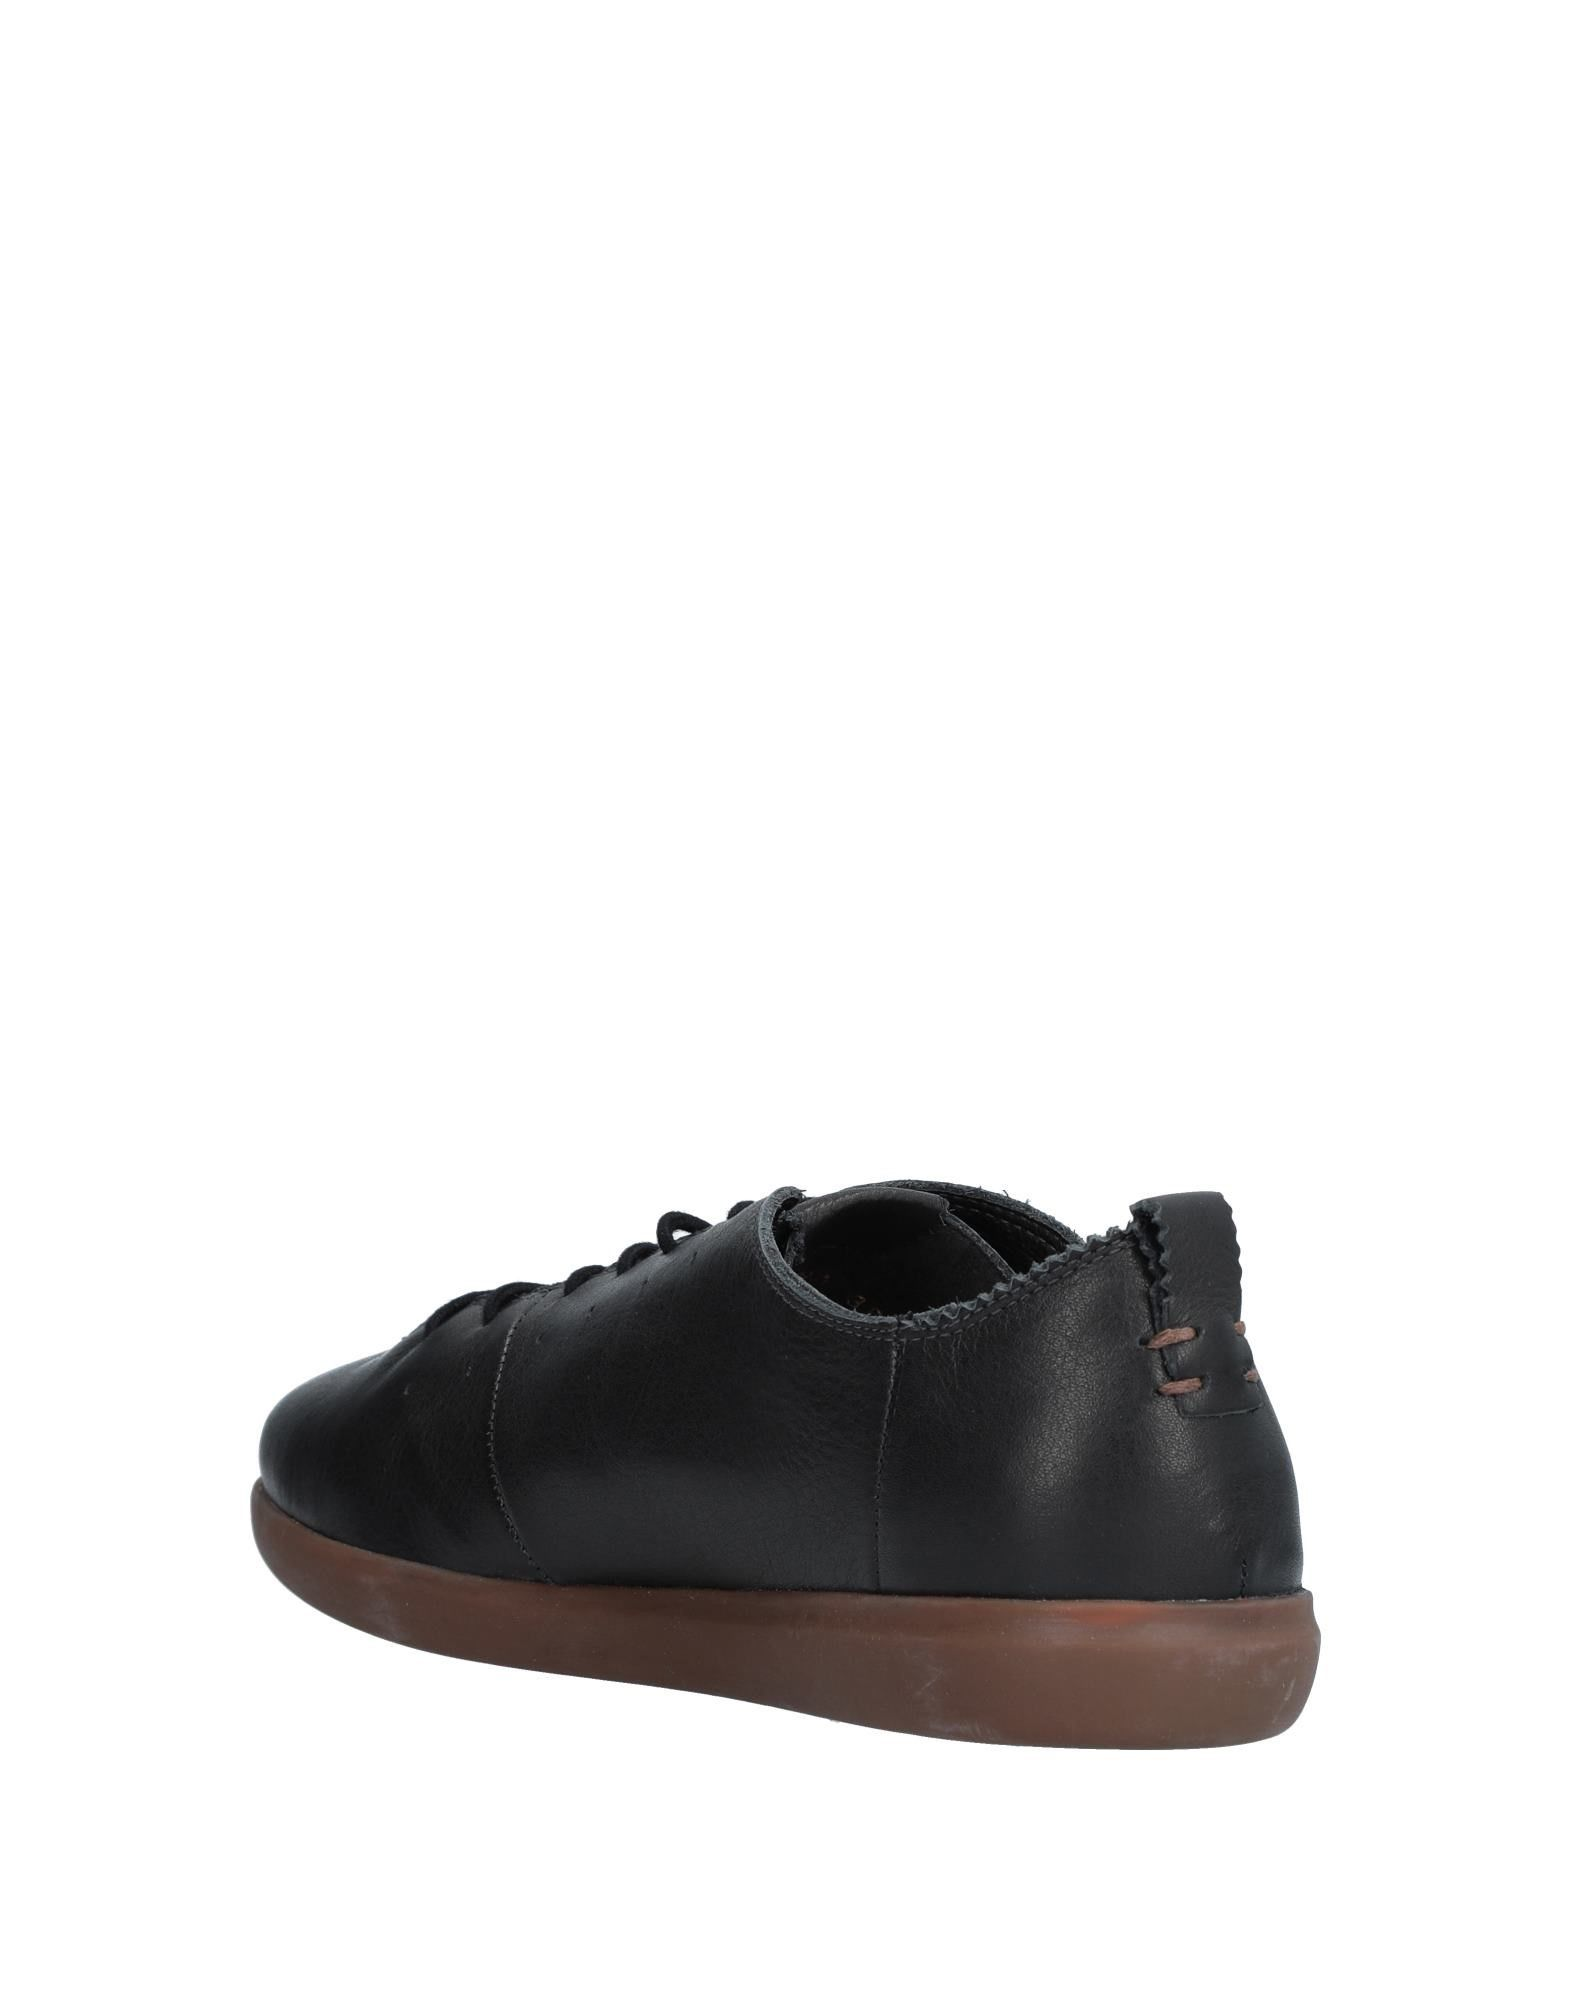 Geox Sneakers Damen beliebte  11192051MS Gute Qualität beliebte Damen Schuhe 0f7203